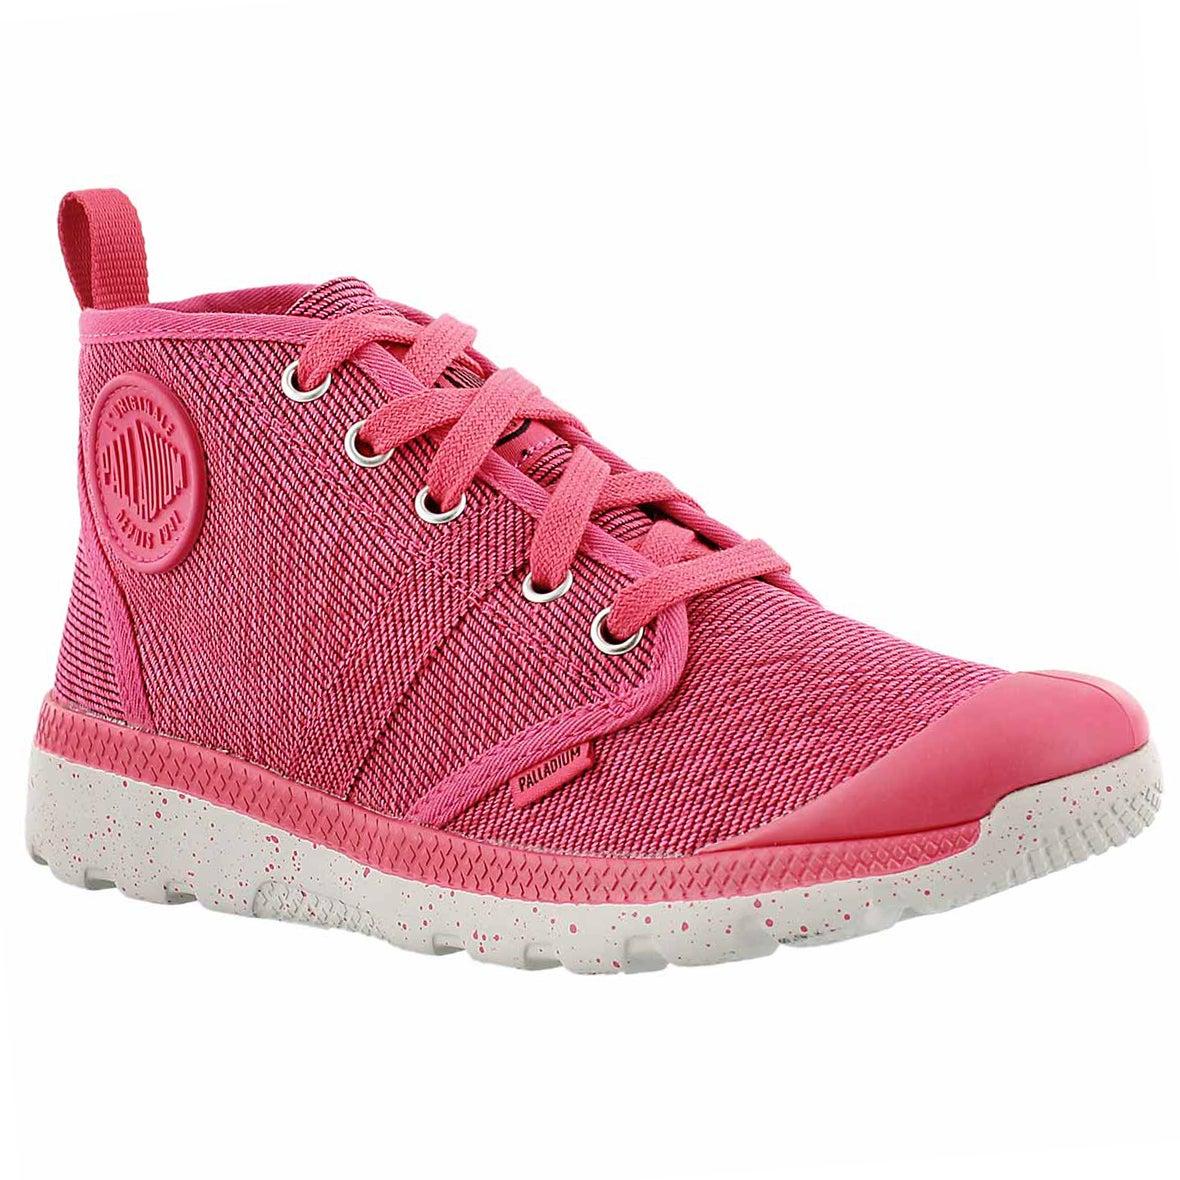 Women's PALLAVILLE HI pink sneakers